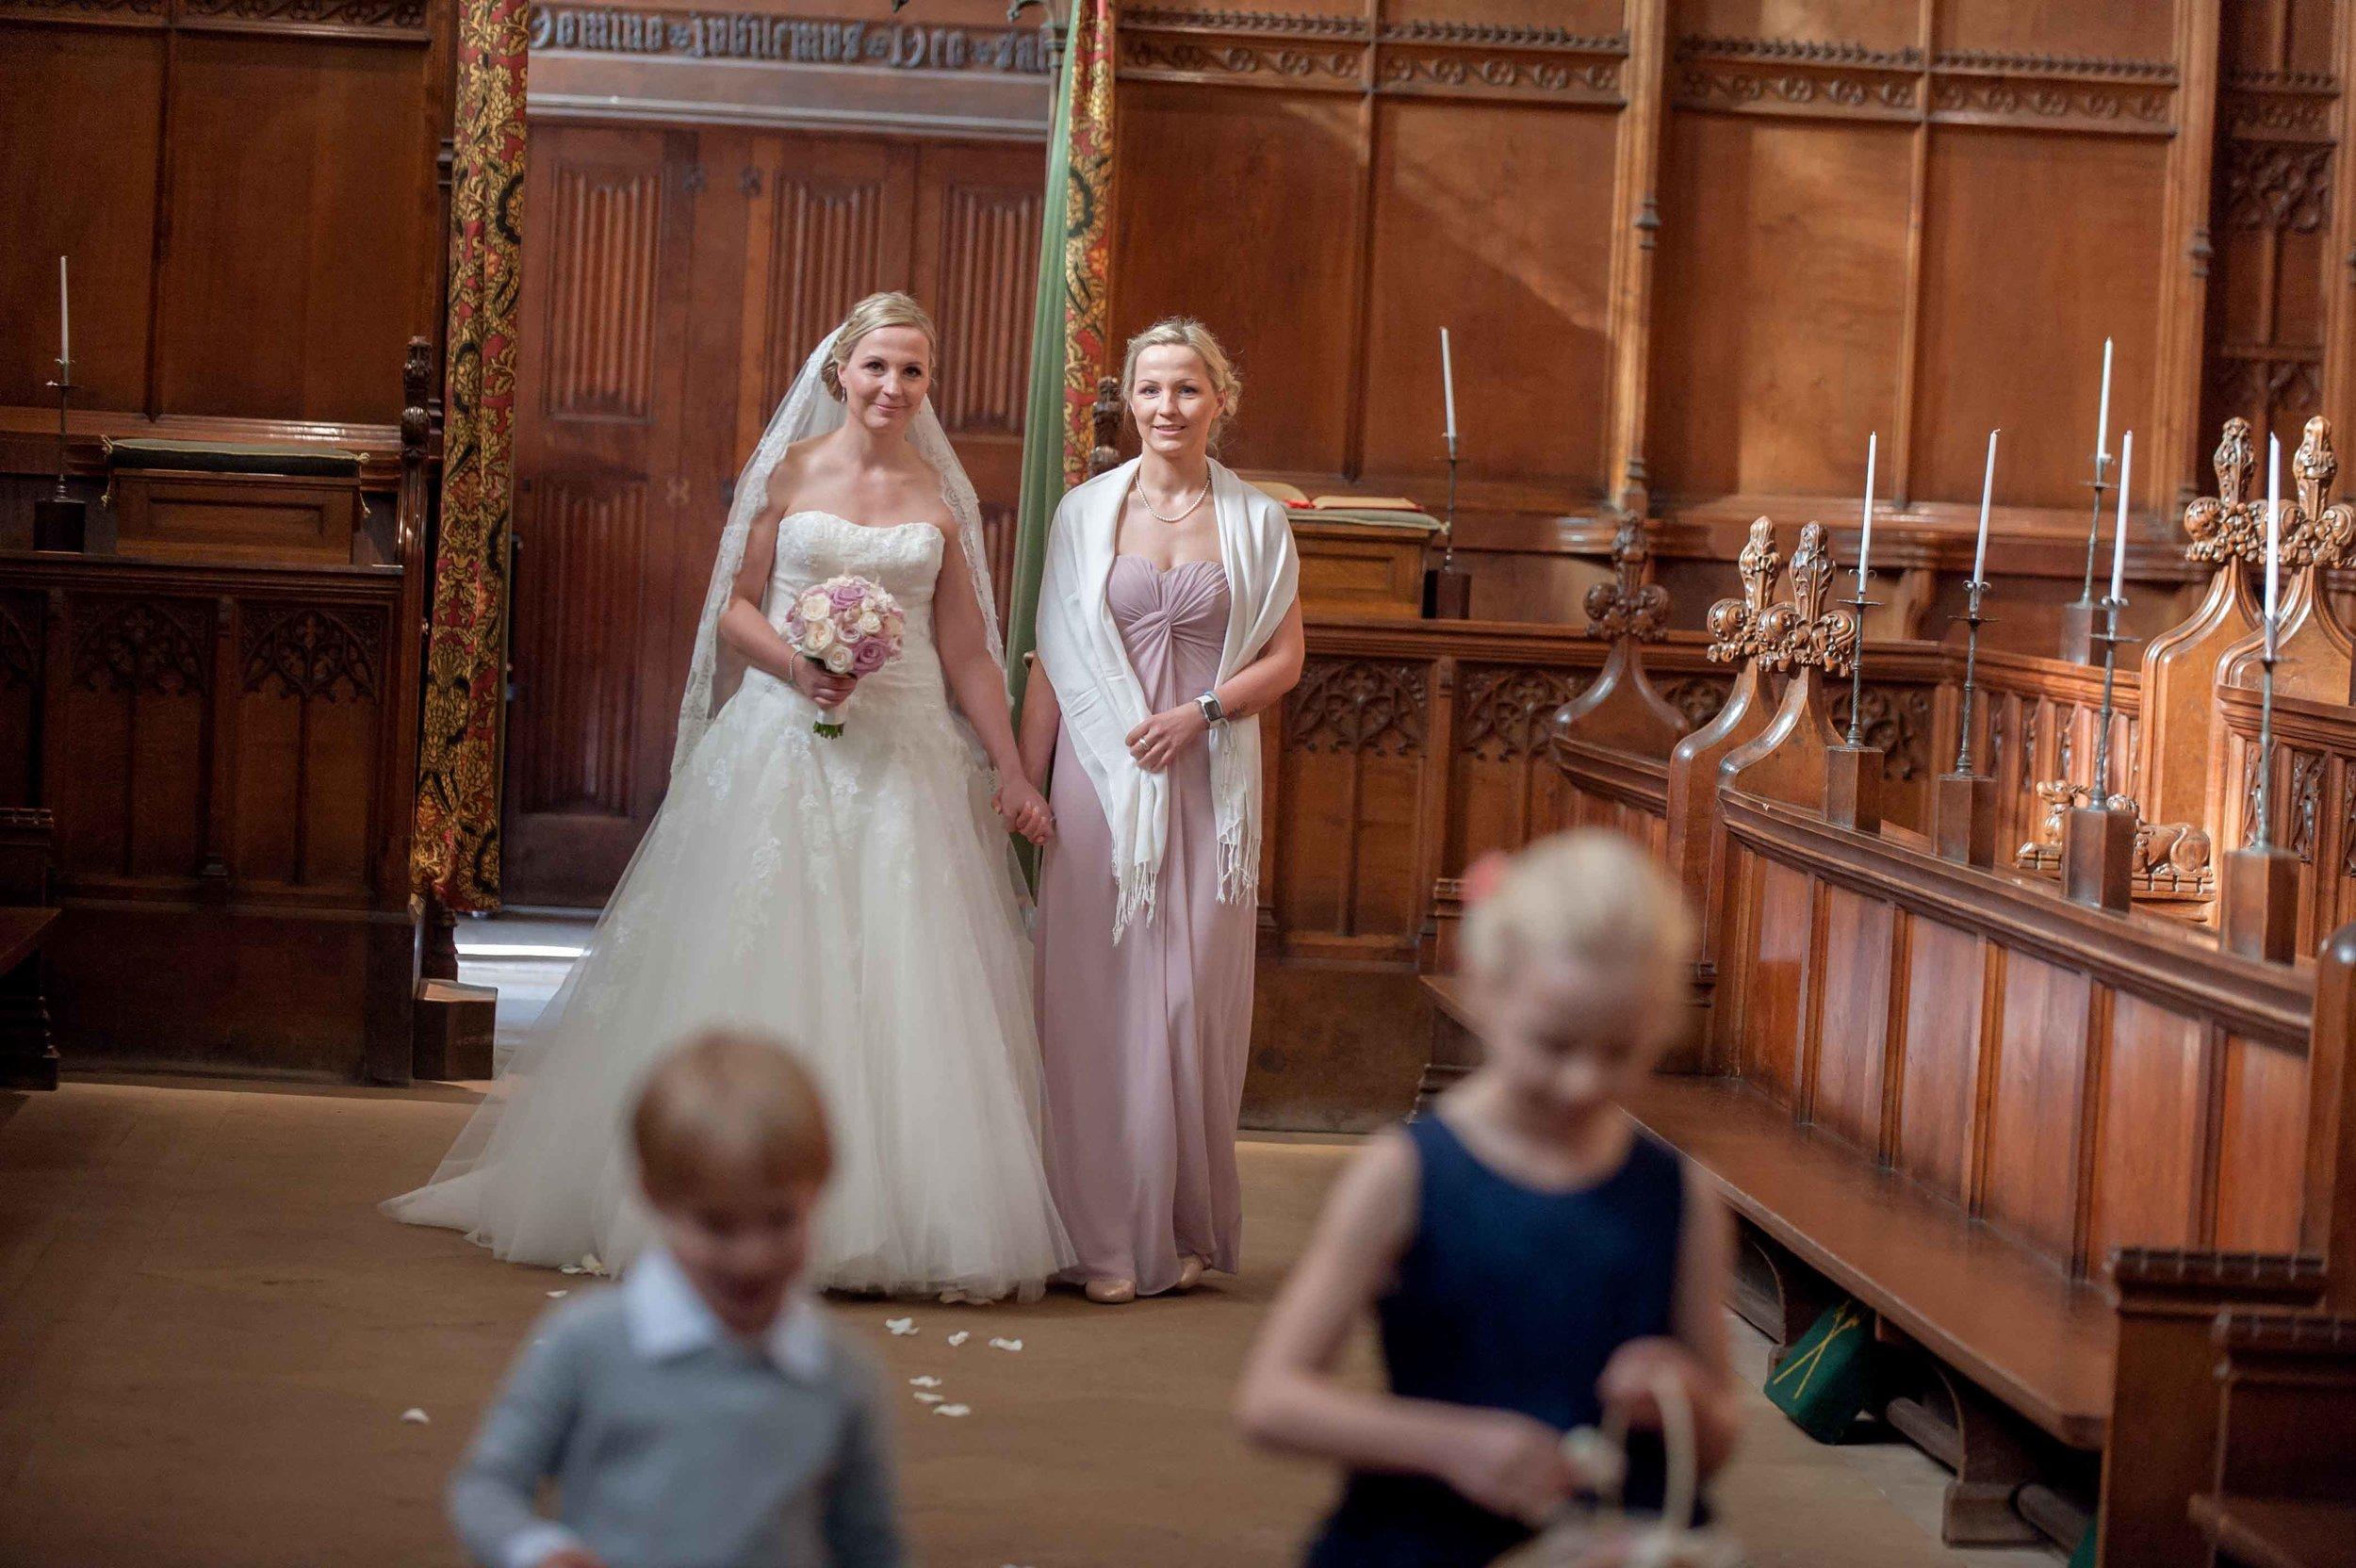 Adrian_Nicole_Charnwood_Weddings_Queens_College_Cambridge-1014.jpg